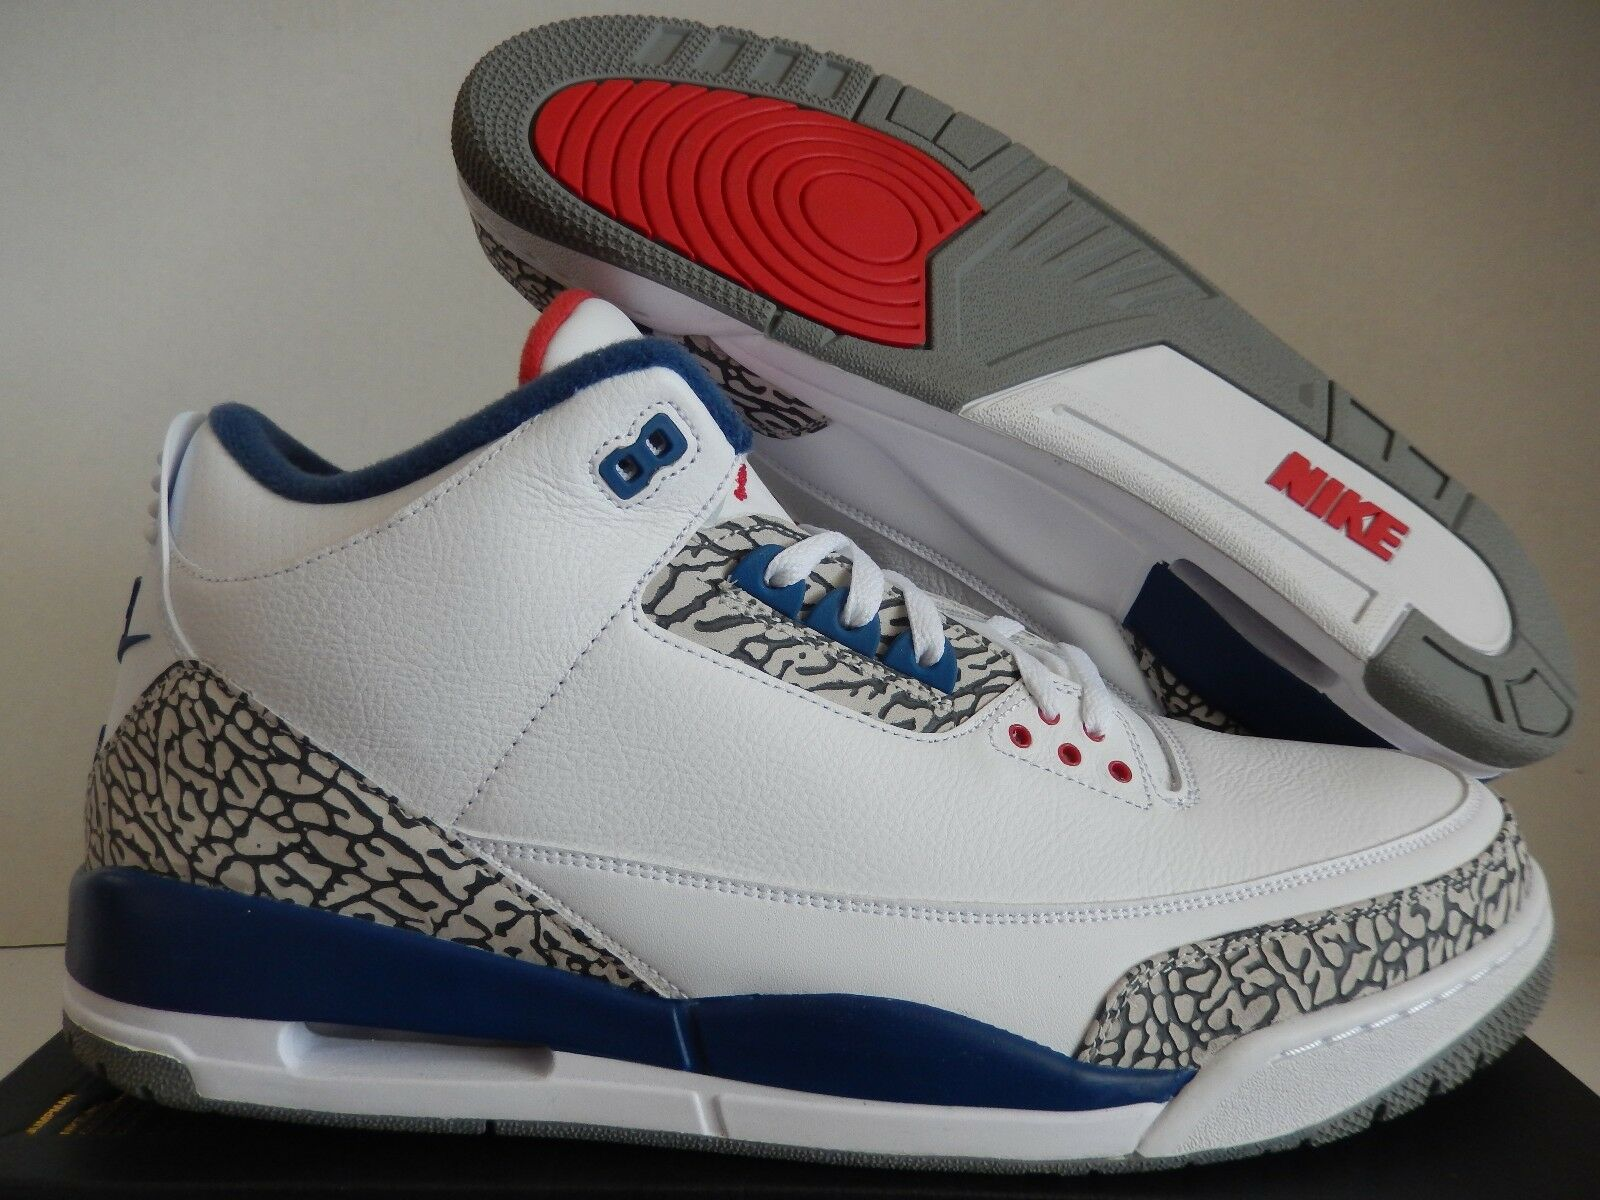 Nike Air Jordan 3 FUEGO-Azul Retro OG Blanco-ROJO FUEGO-Azul 3 Verdadero [854262-106] 5ae31c